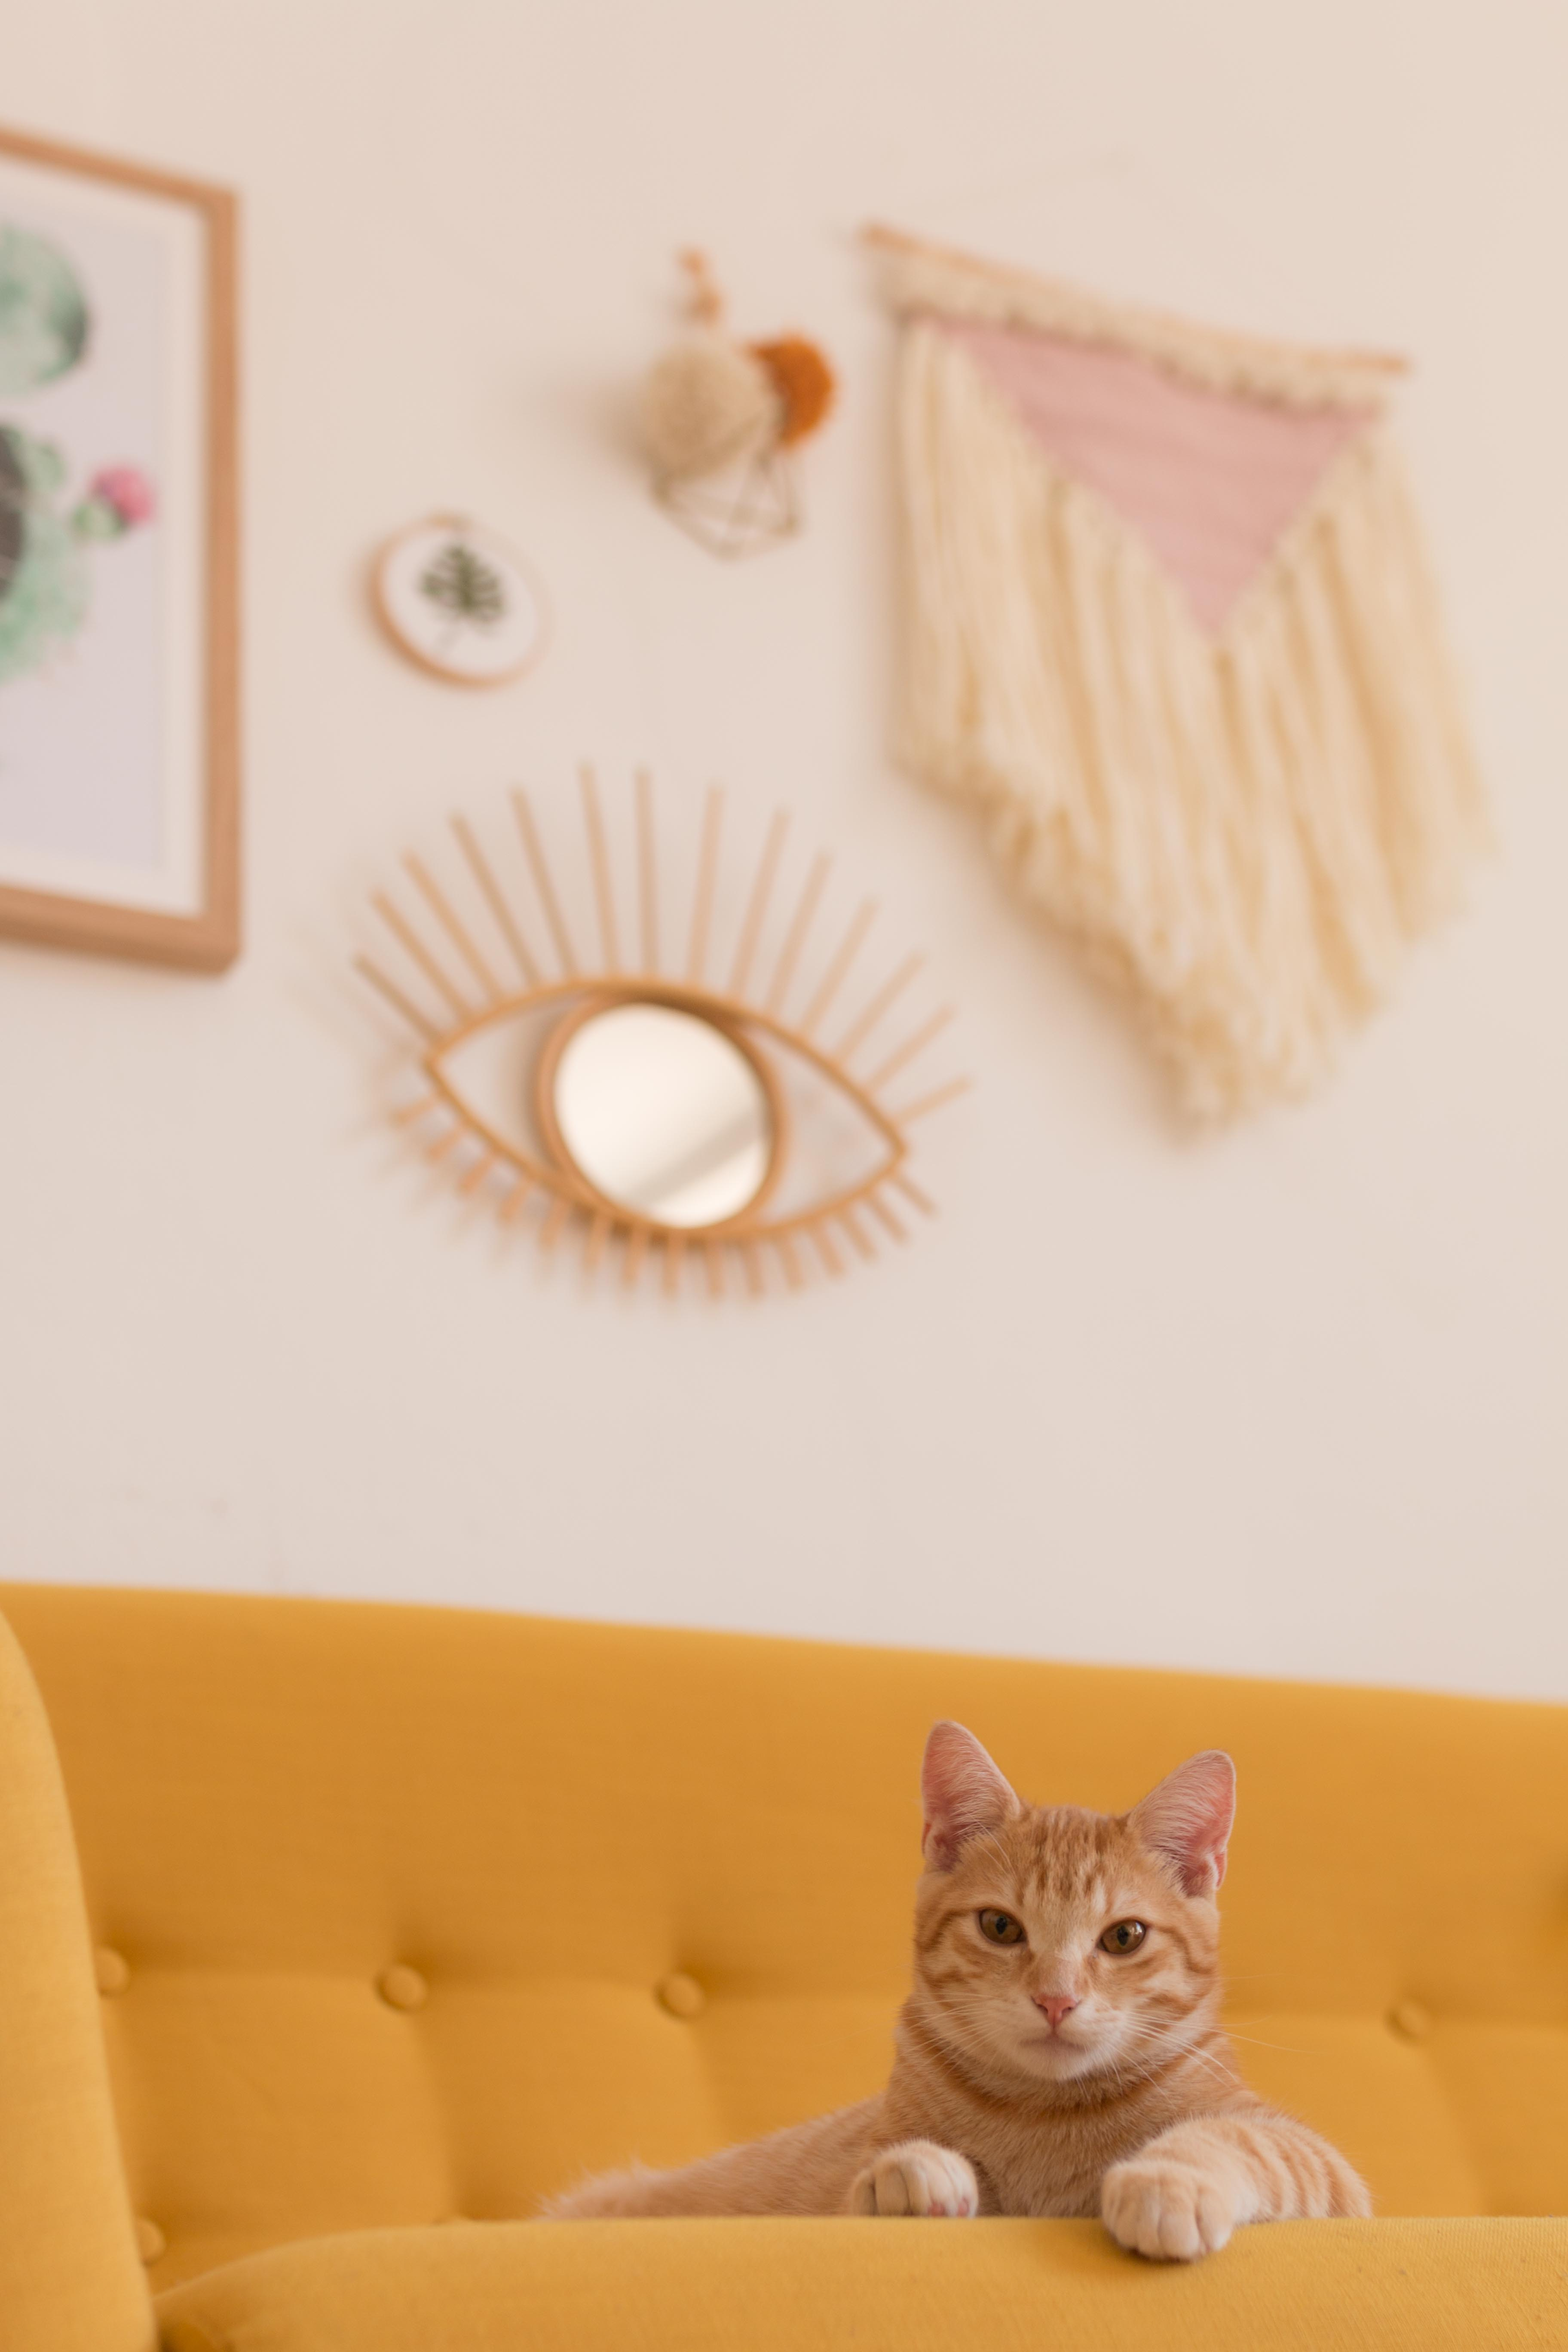 deco-de-mon-salon-home-cute-sweet-home-i-sp4nkblog-8